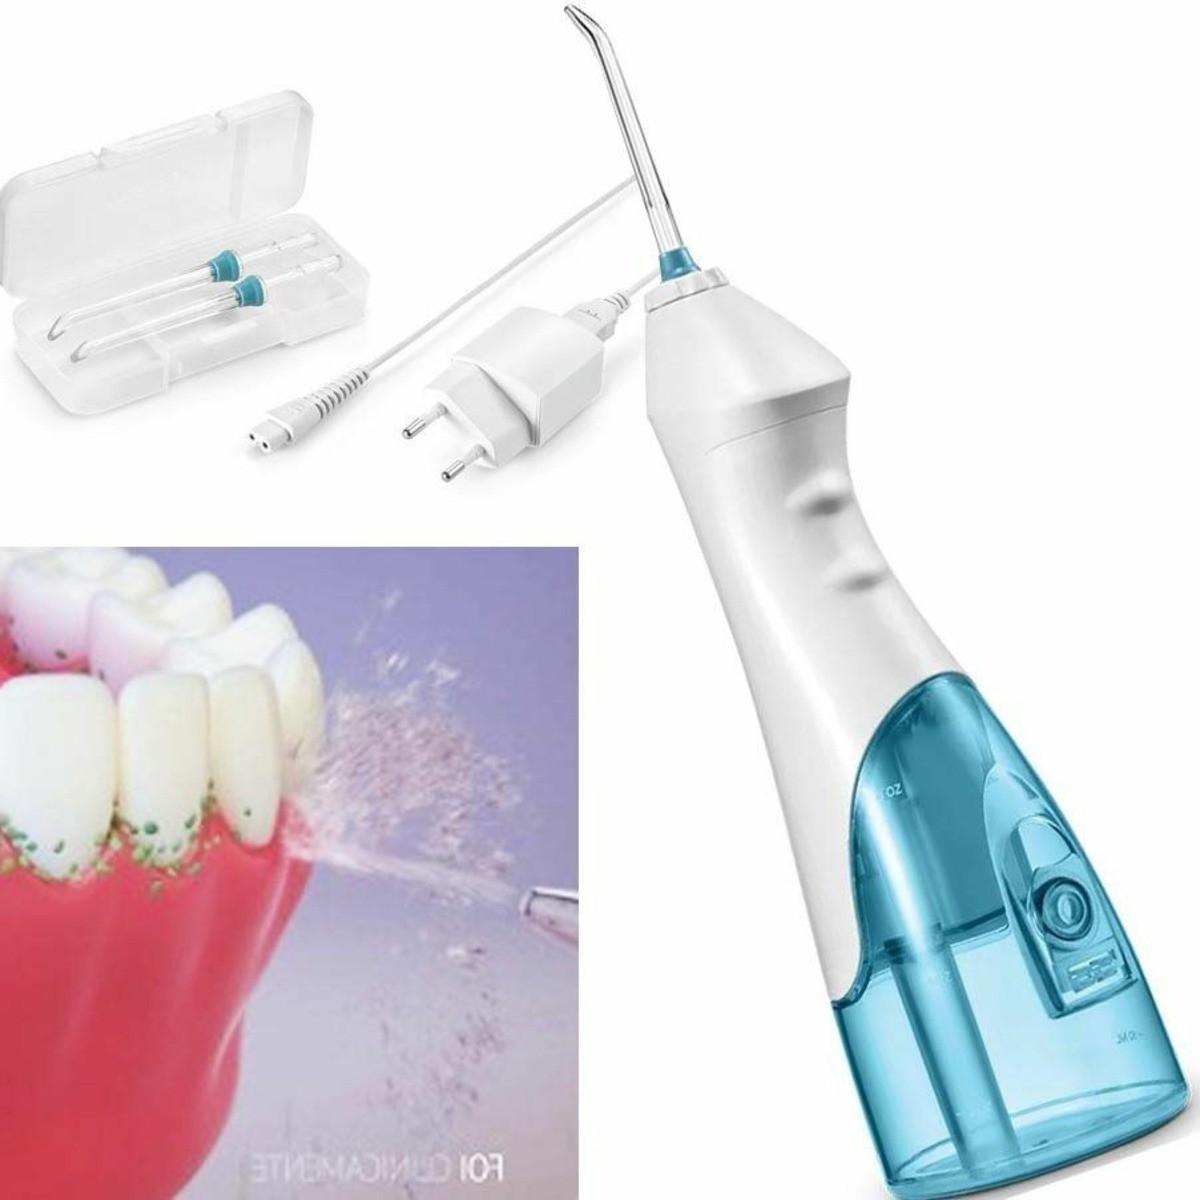 Irrigador Oral Clearpik Portable Limpeza Profunda Multilaser Branco/Azul- HC036